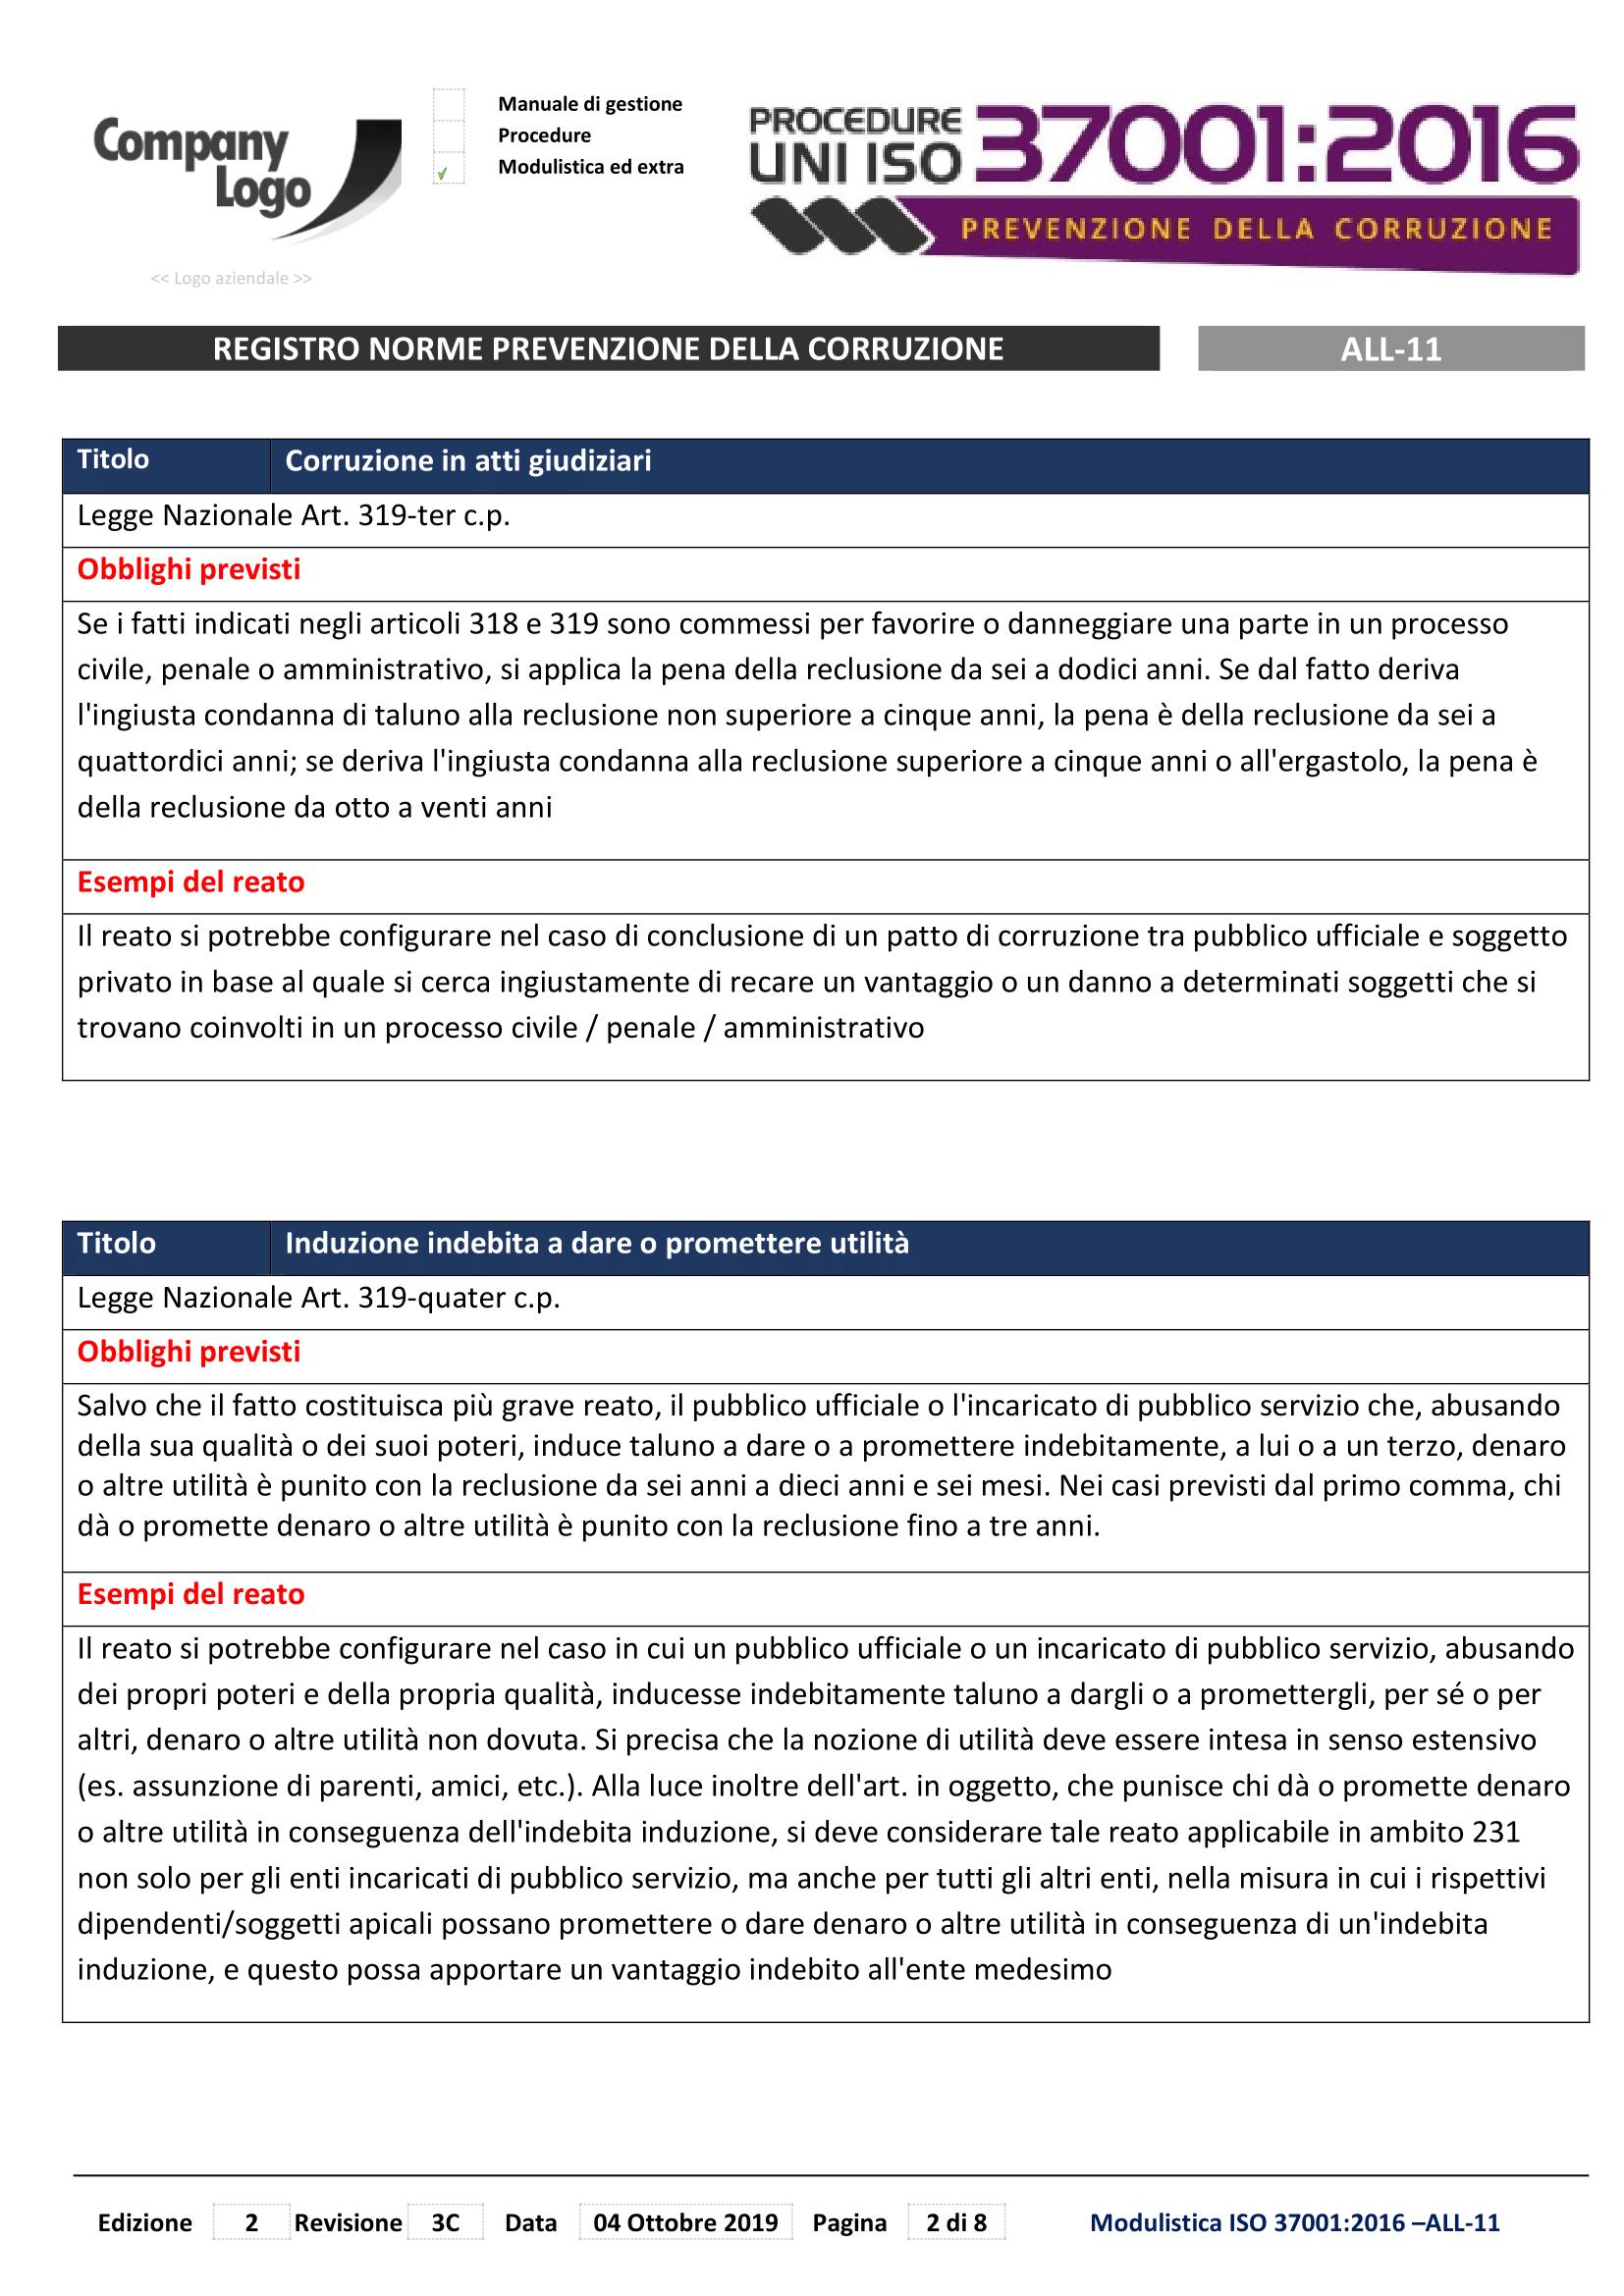 19.registro-norme-iso-37001